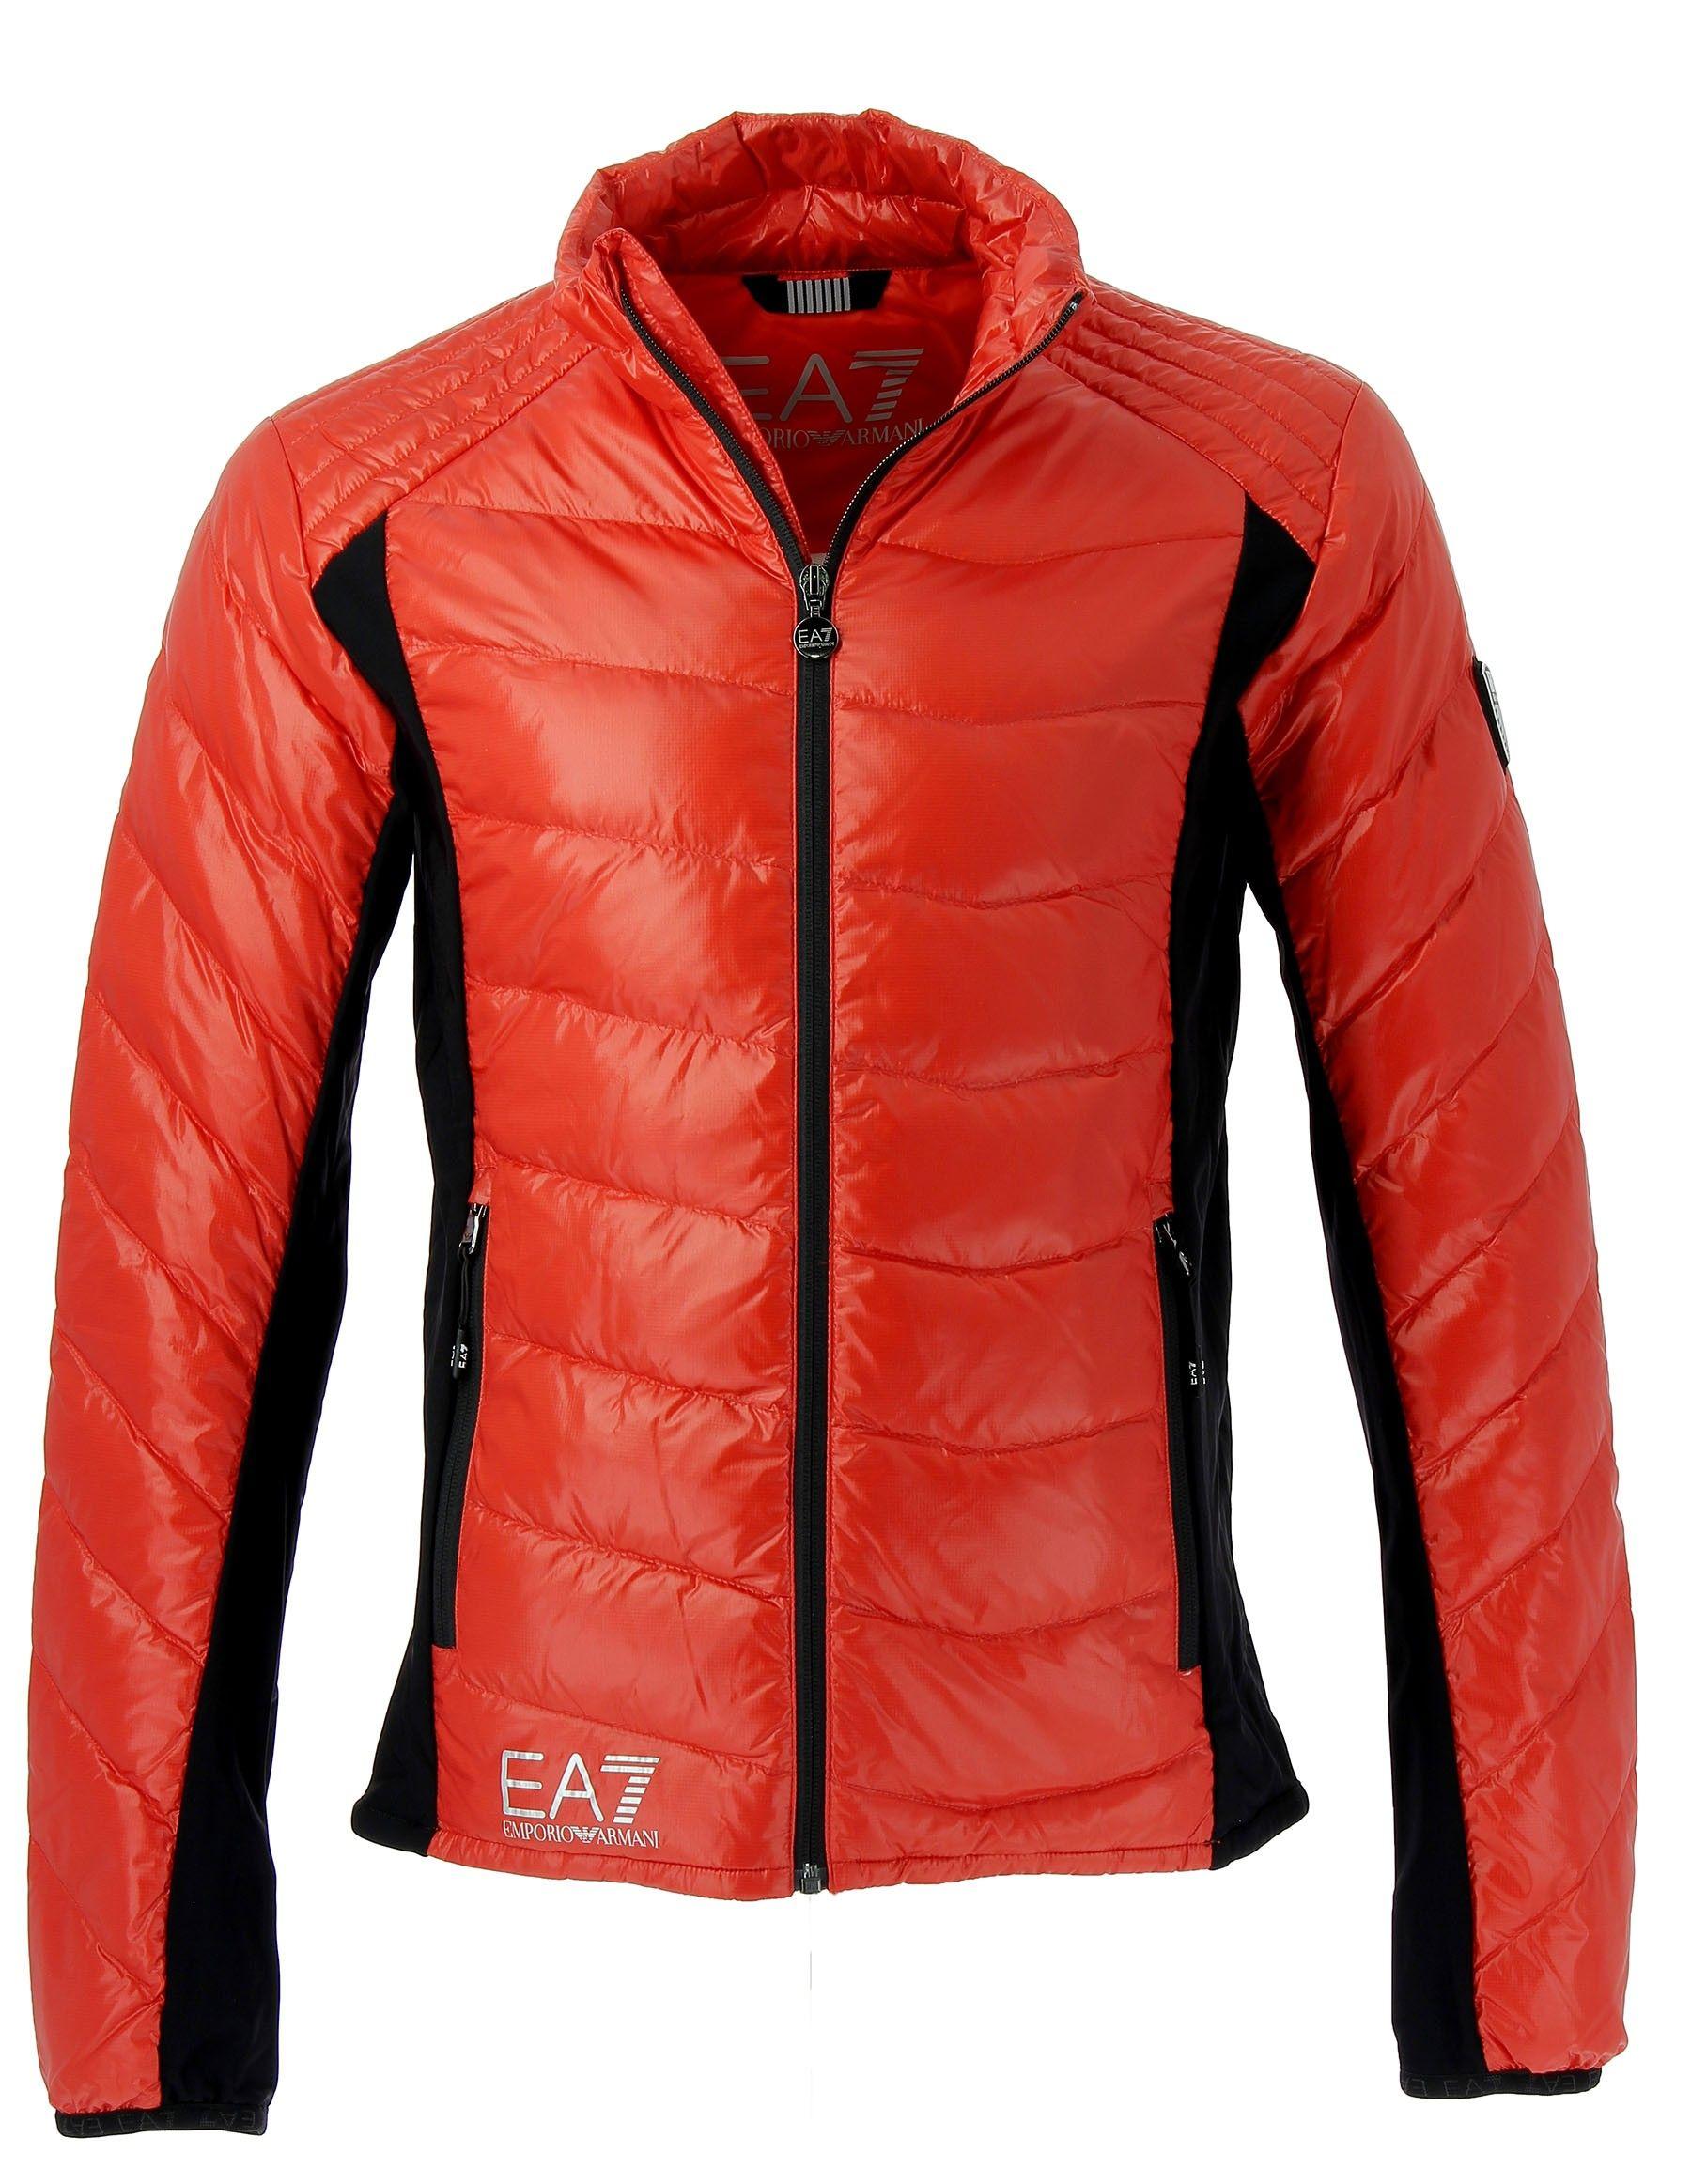 Doudoune EA7 Down Jacket Emporio Armani - Pegashoes 093e26330fe1